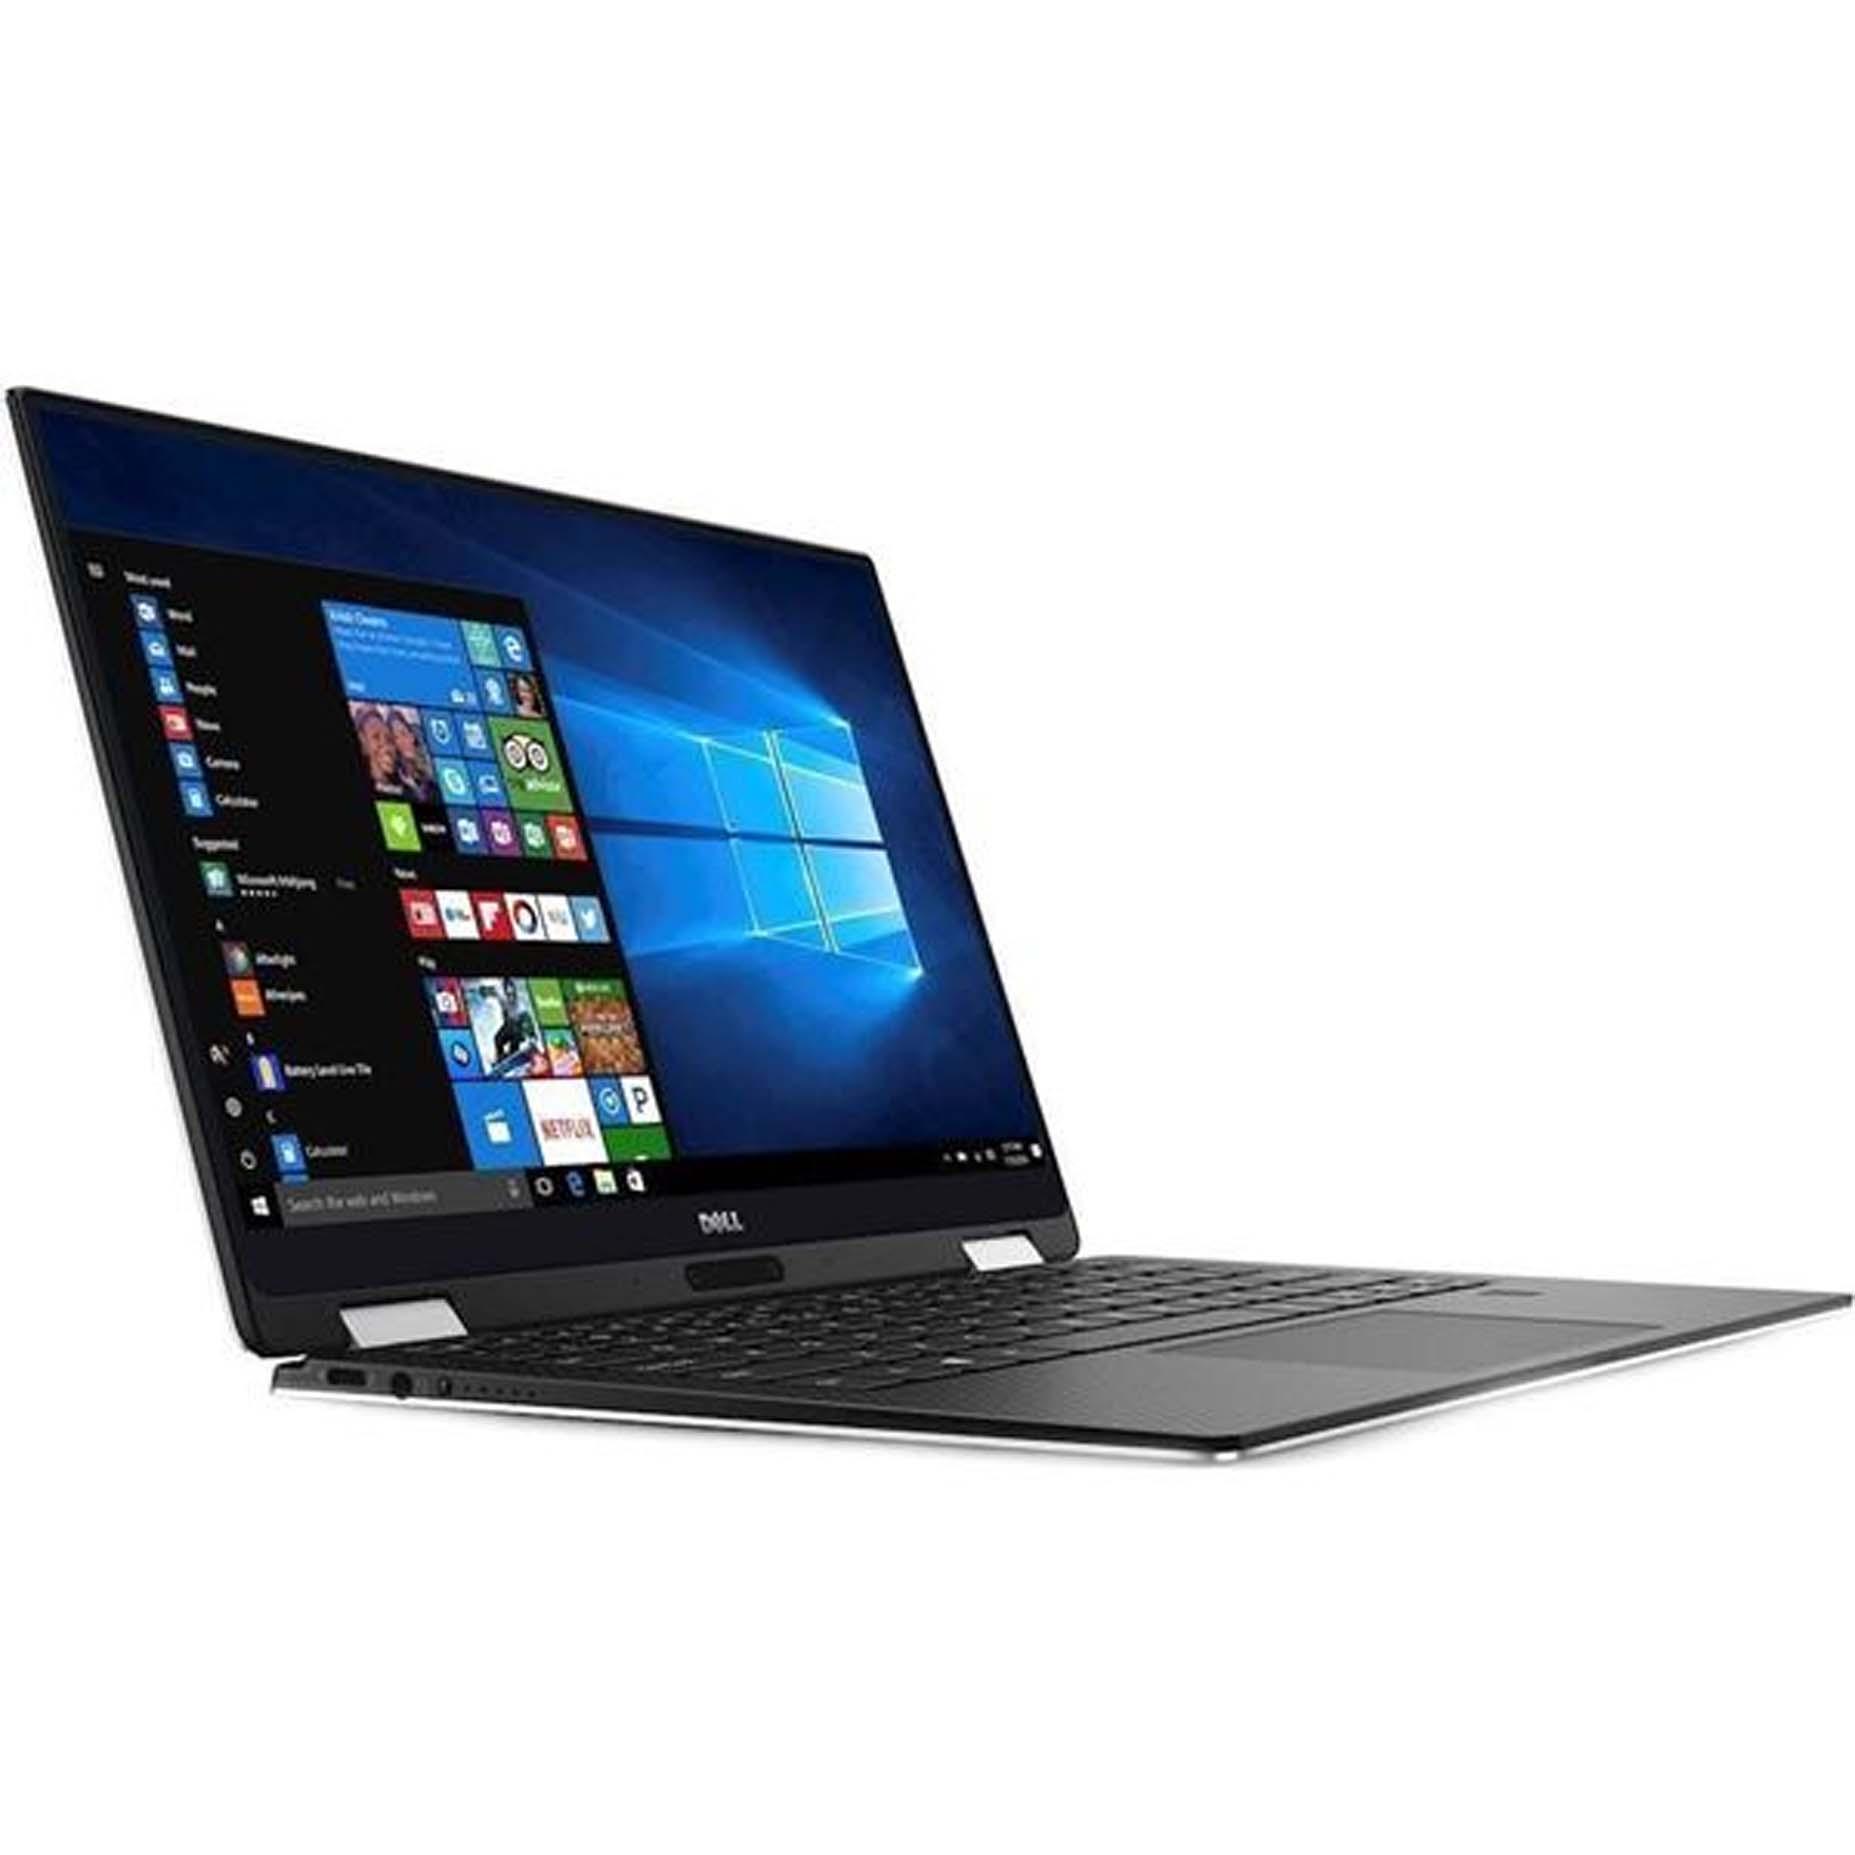 Harga Jual Laptop Dell XPS 13 2-in-1 (9365) Intel Core i7-7Y75